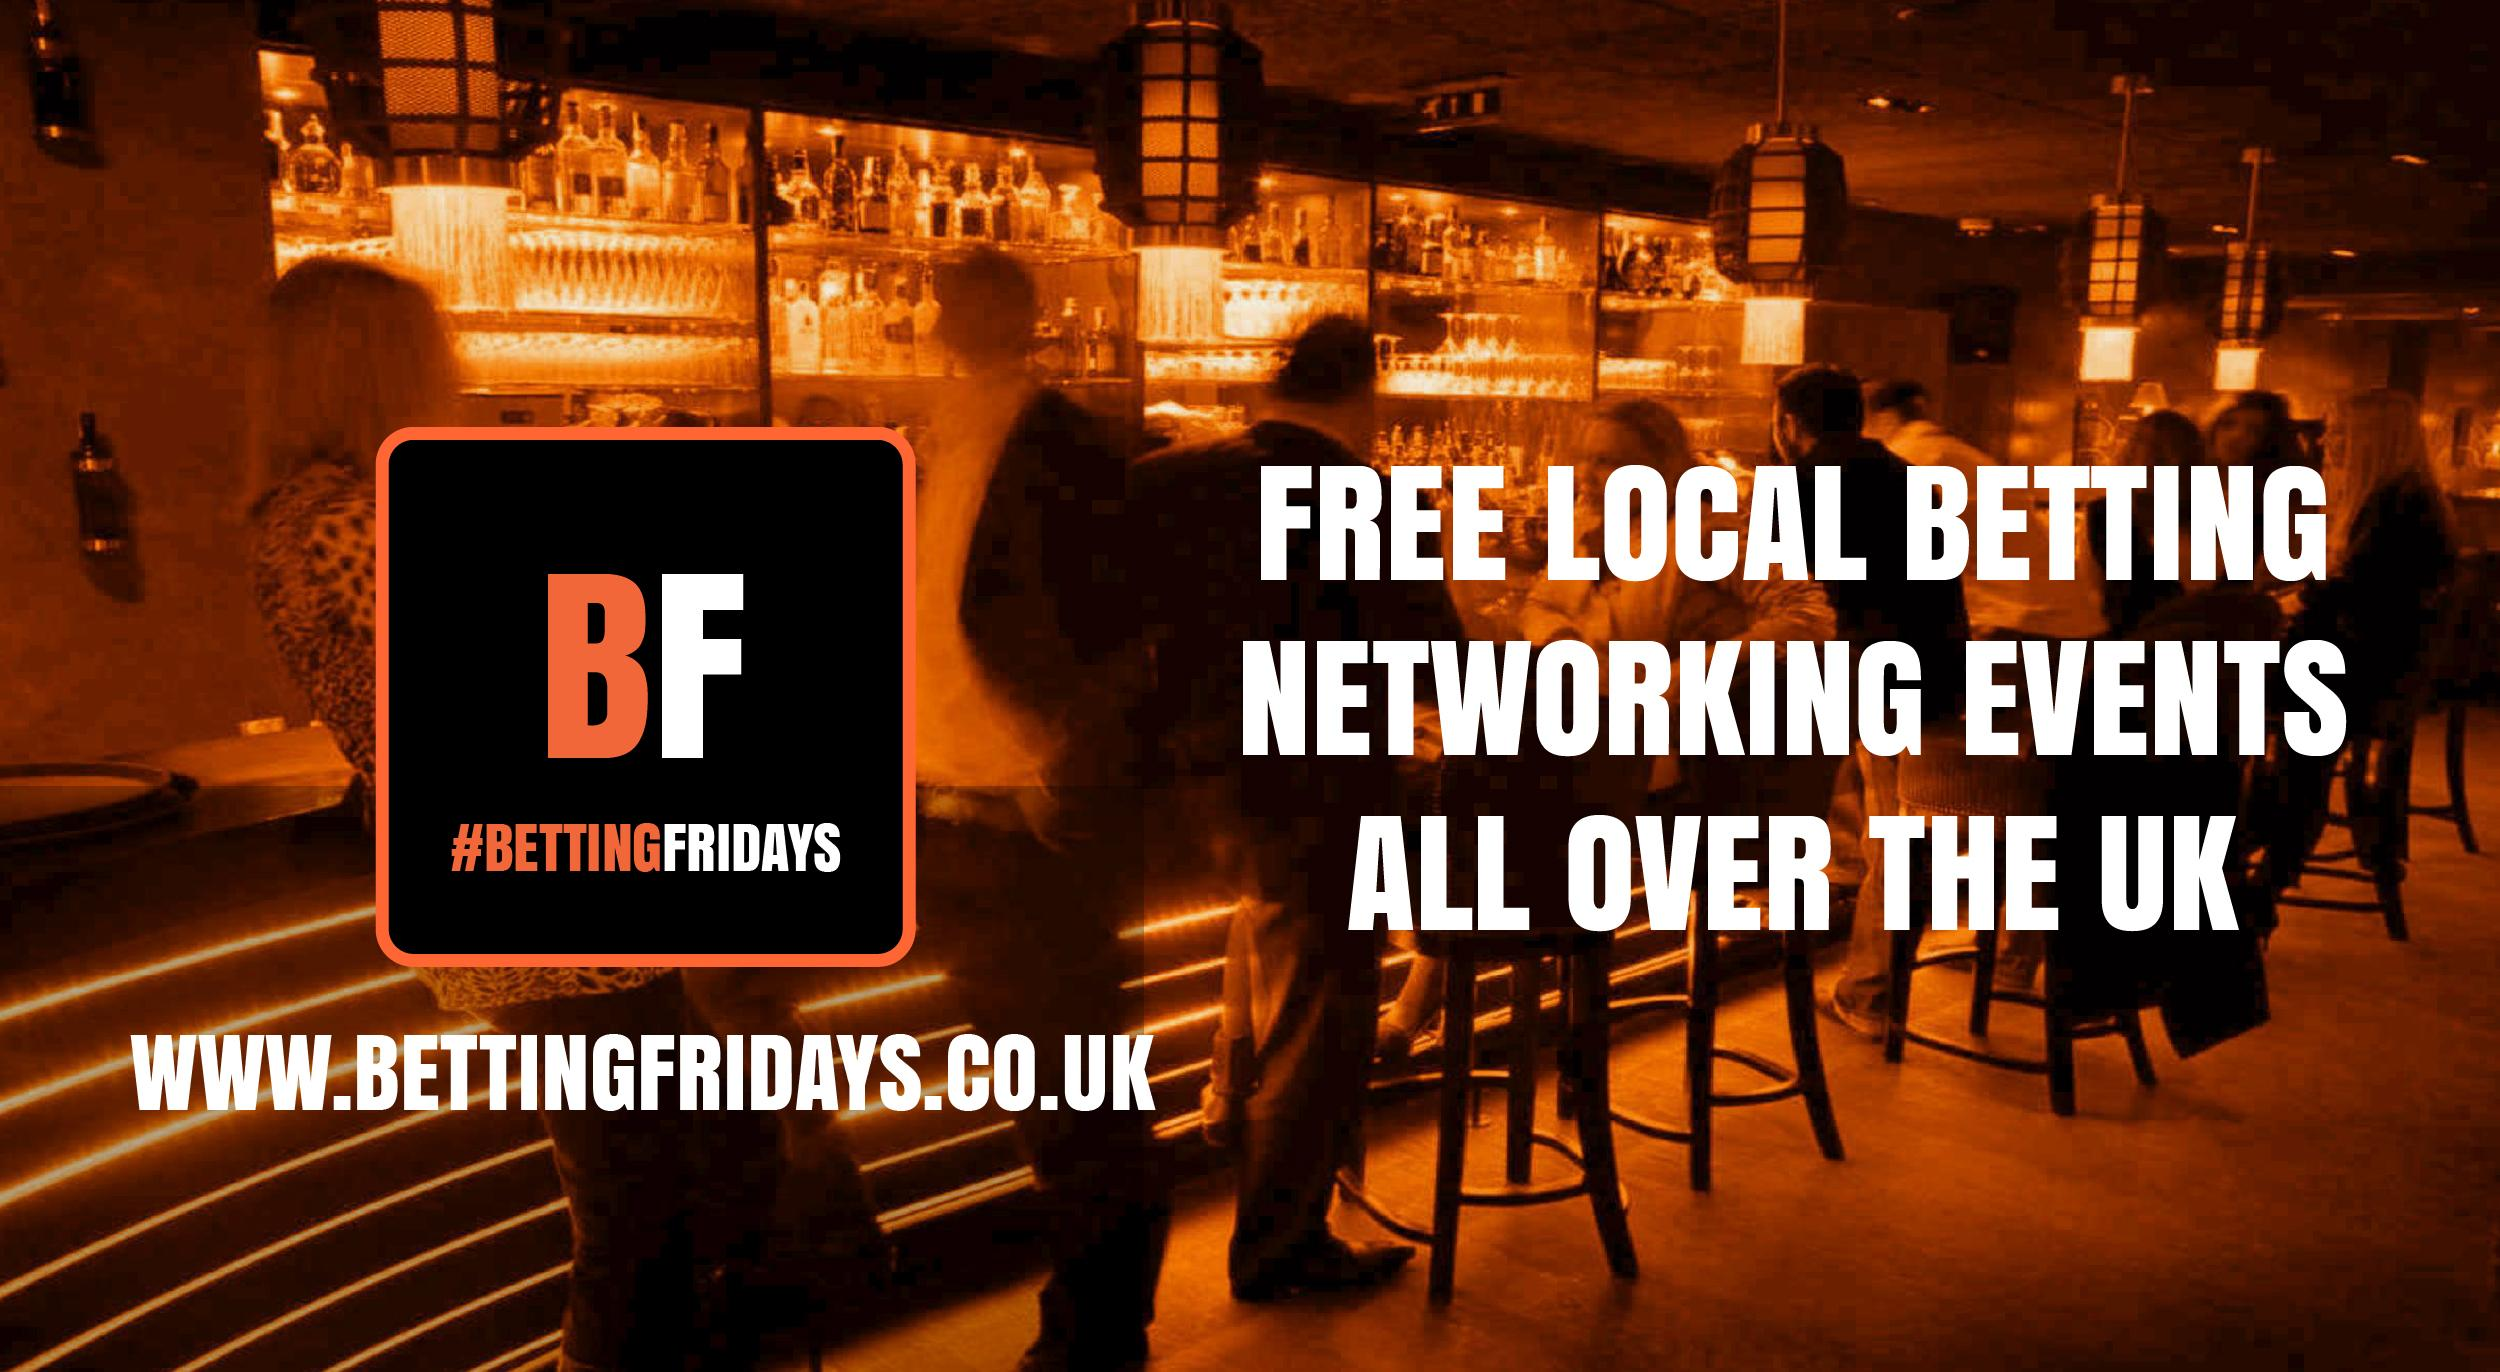 Betting Fridays! Free betting networking event in Stalybridge